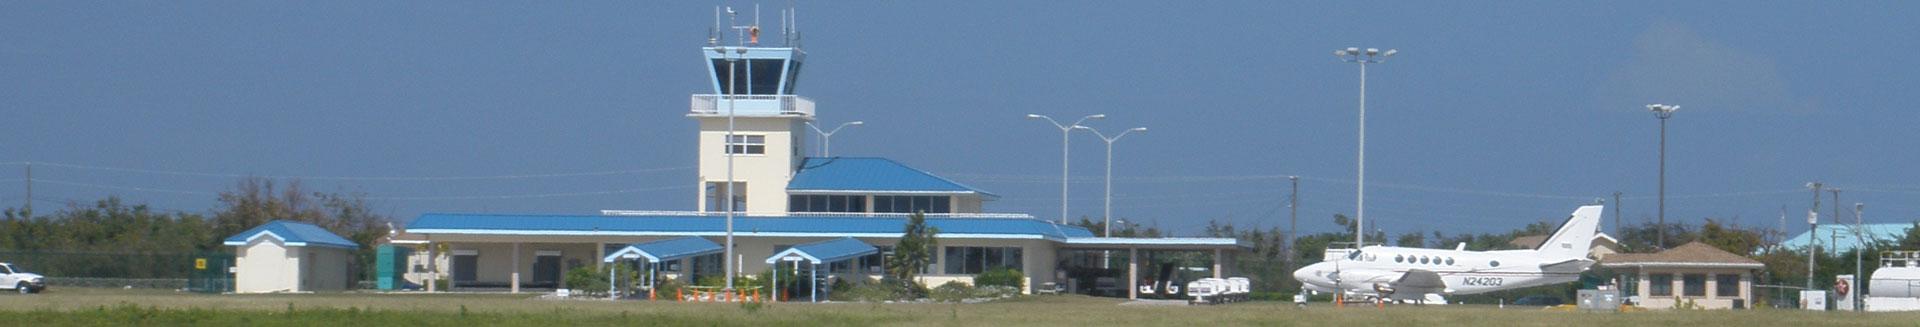 Cayman Brac Departures